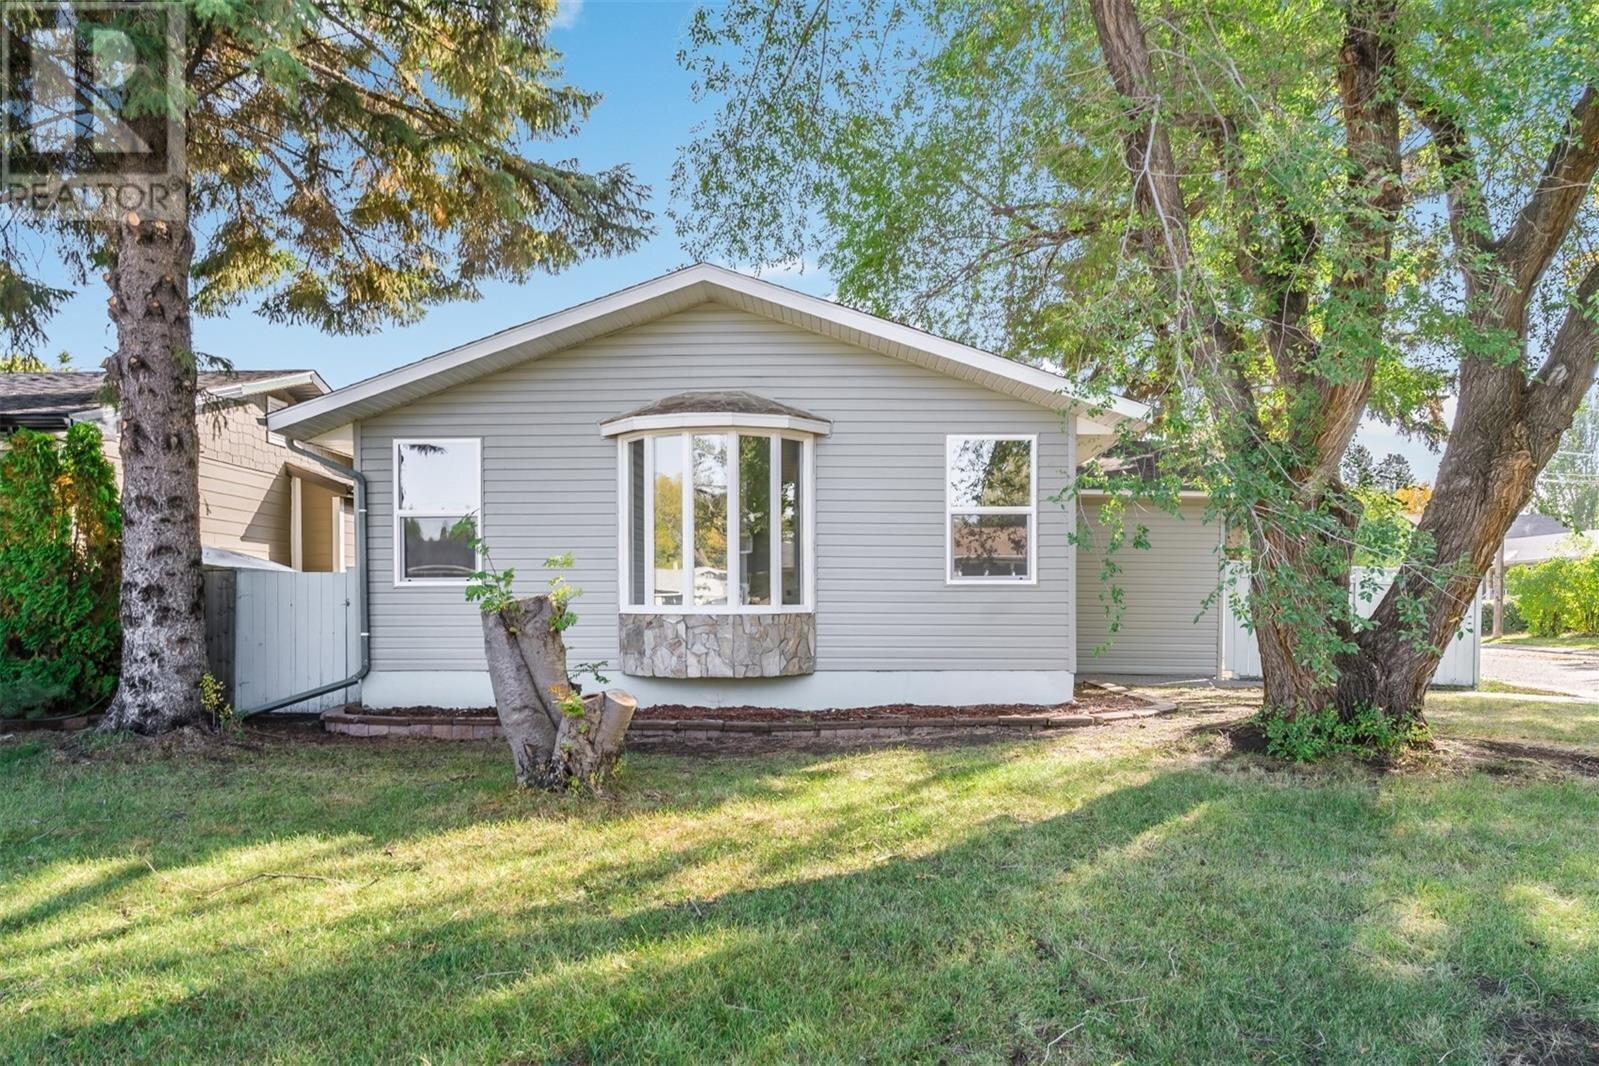 House for sale at 21 Britnell Cres Saskatoon Saskatchewan - MLS: SK827641